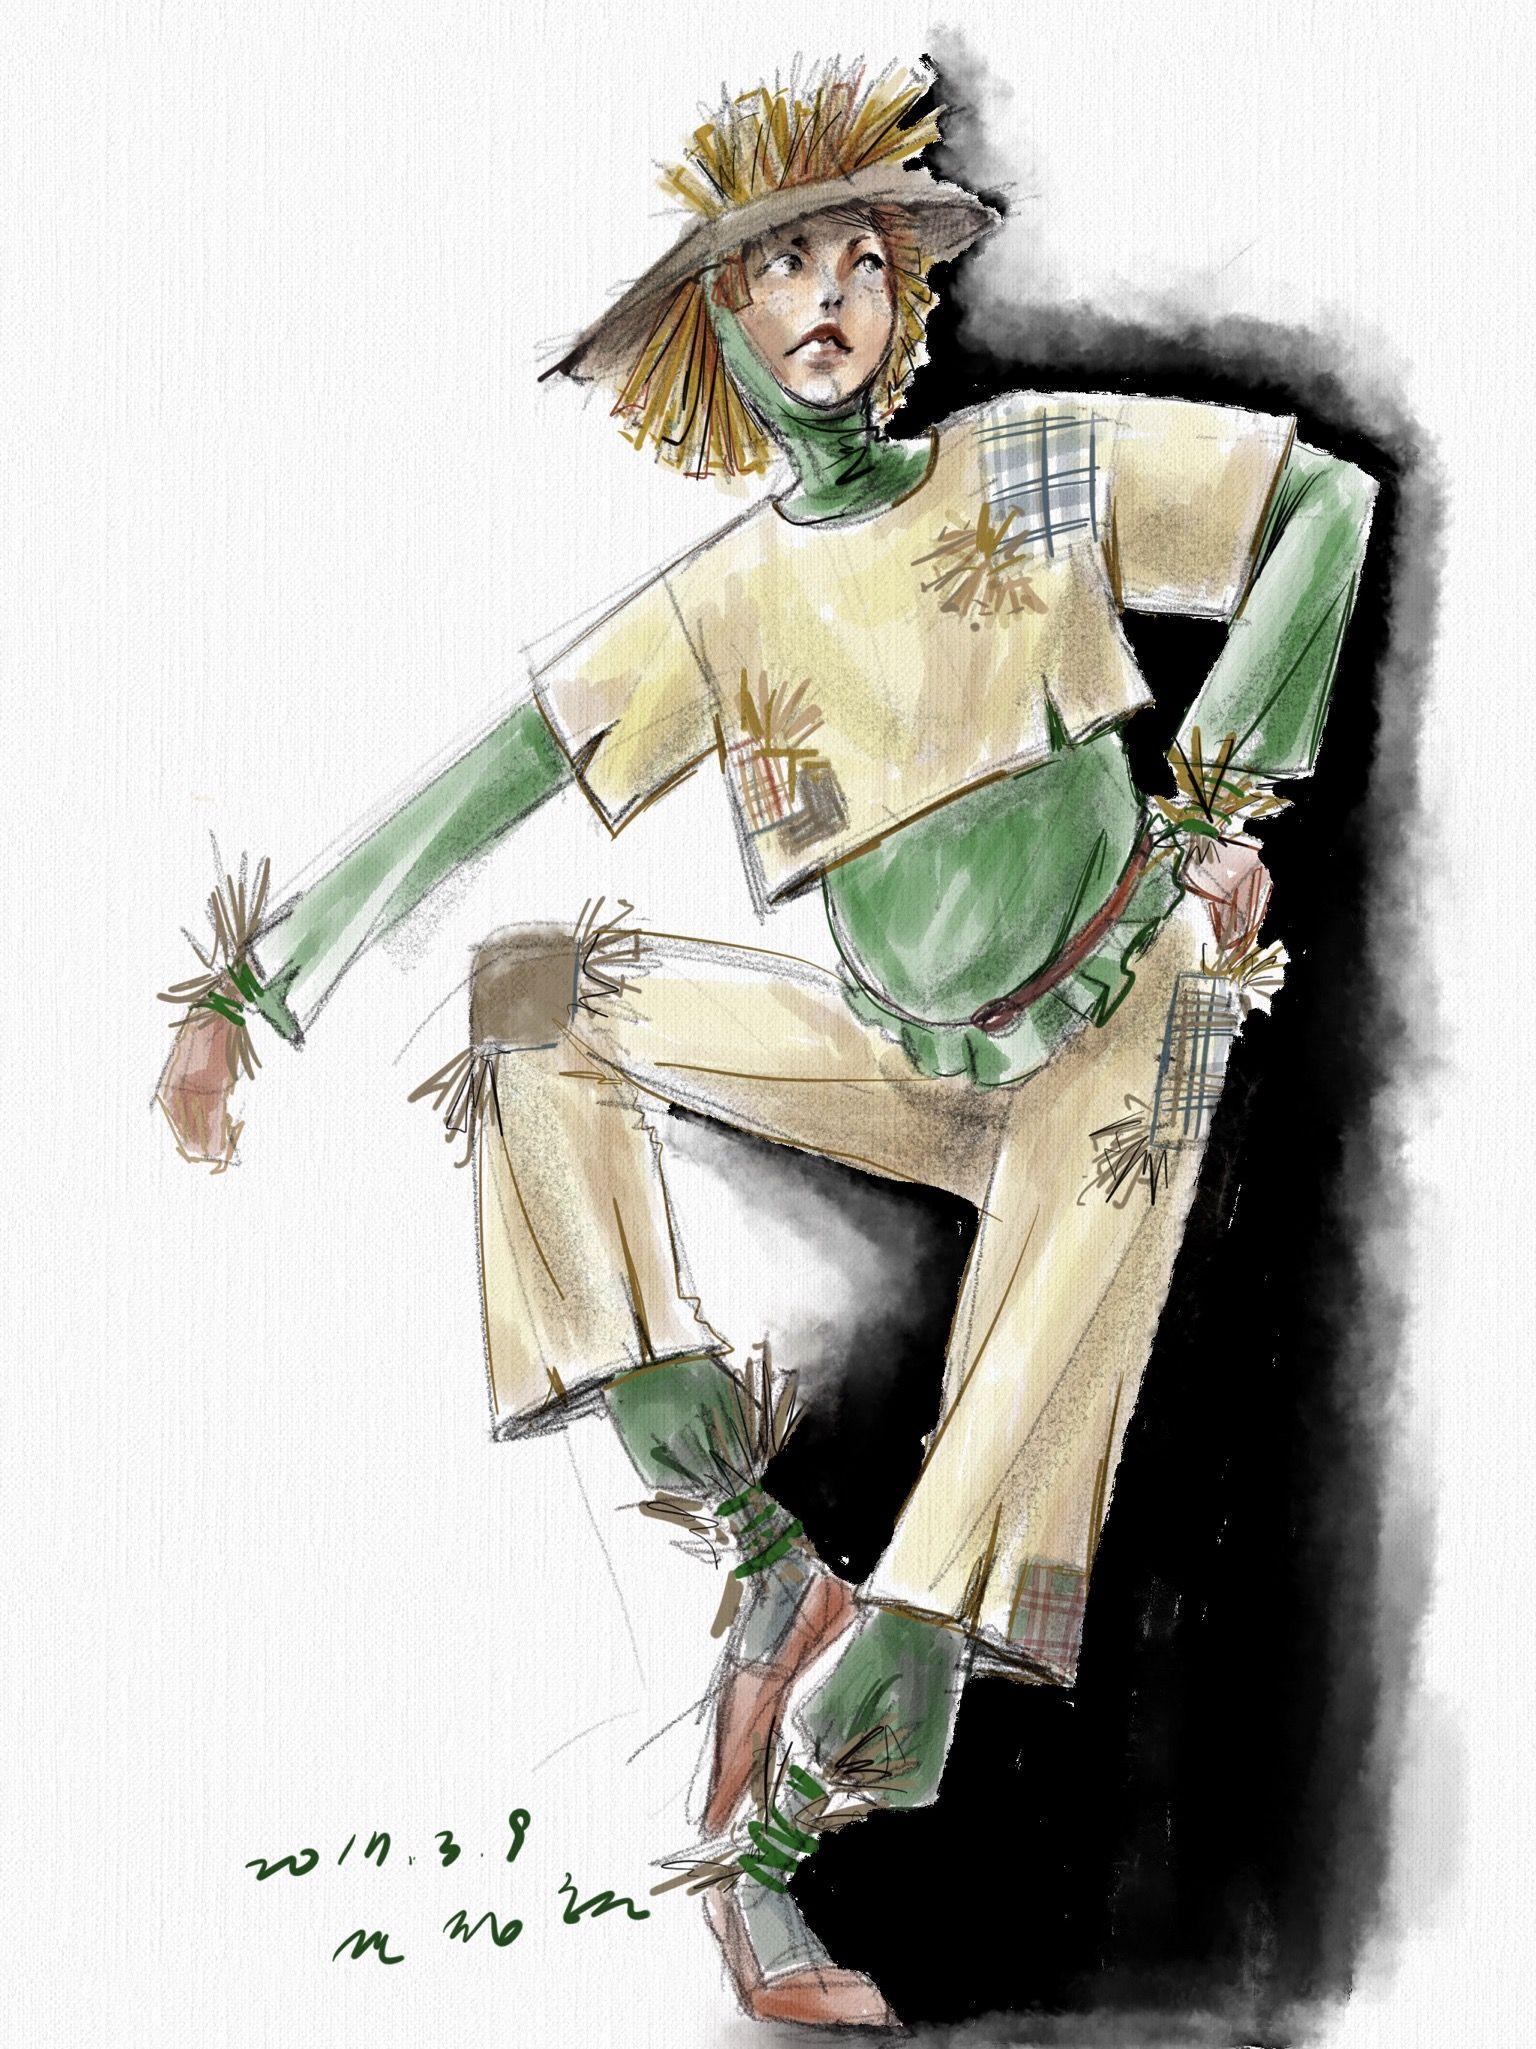 costume drawing-오즈의마법사-허수압ㅣ